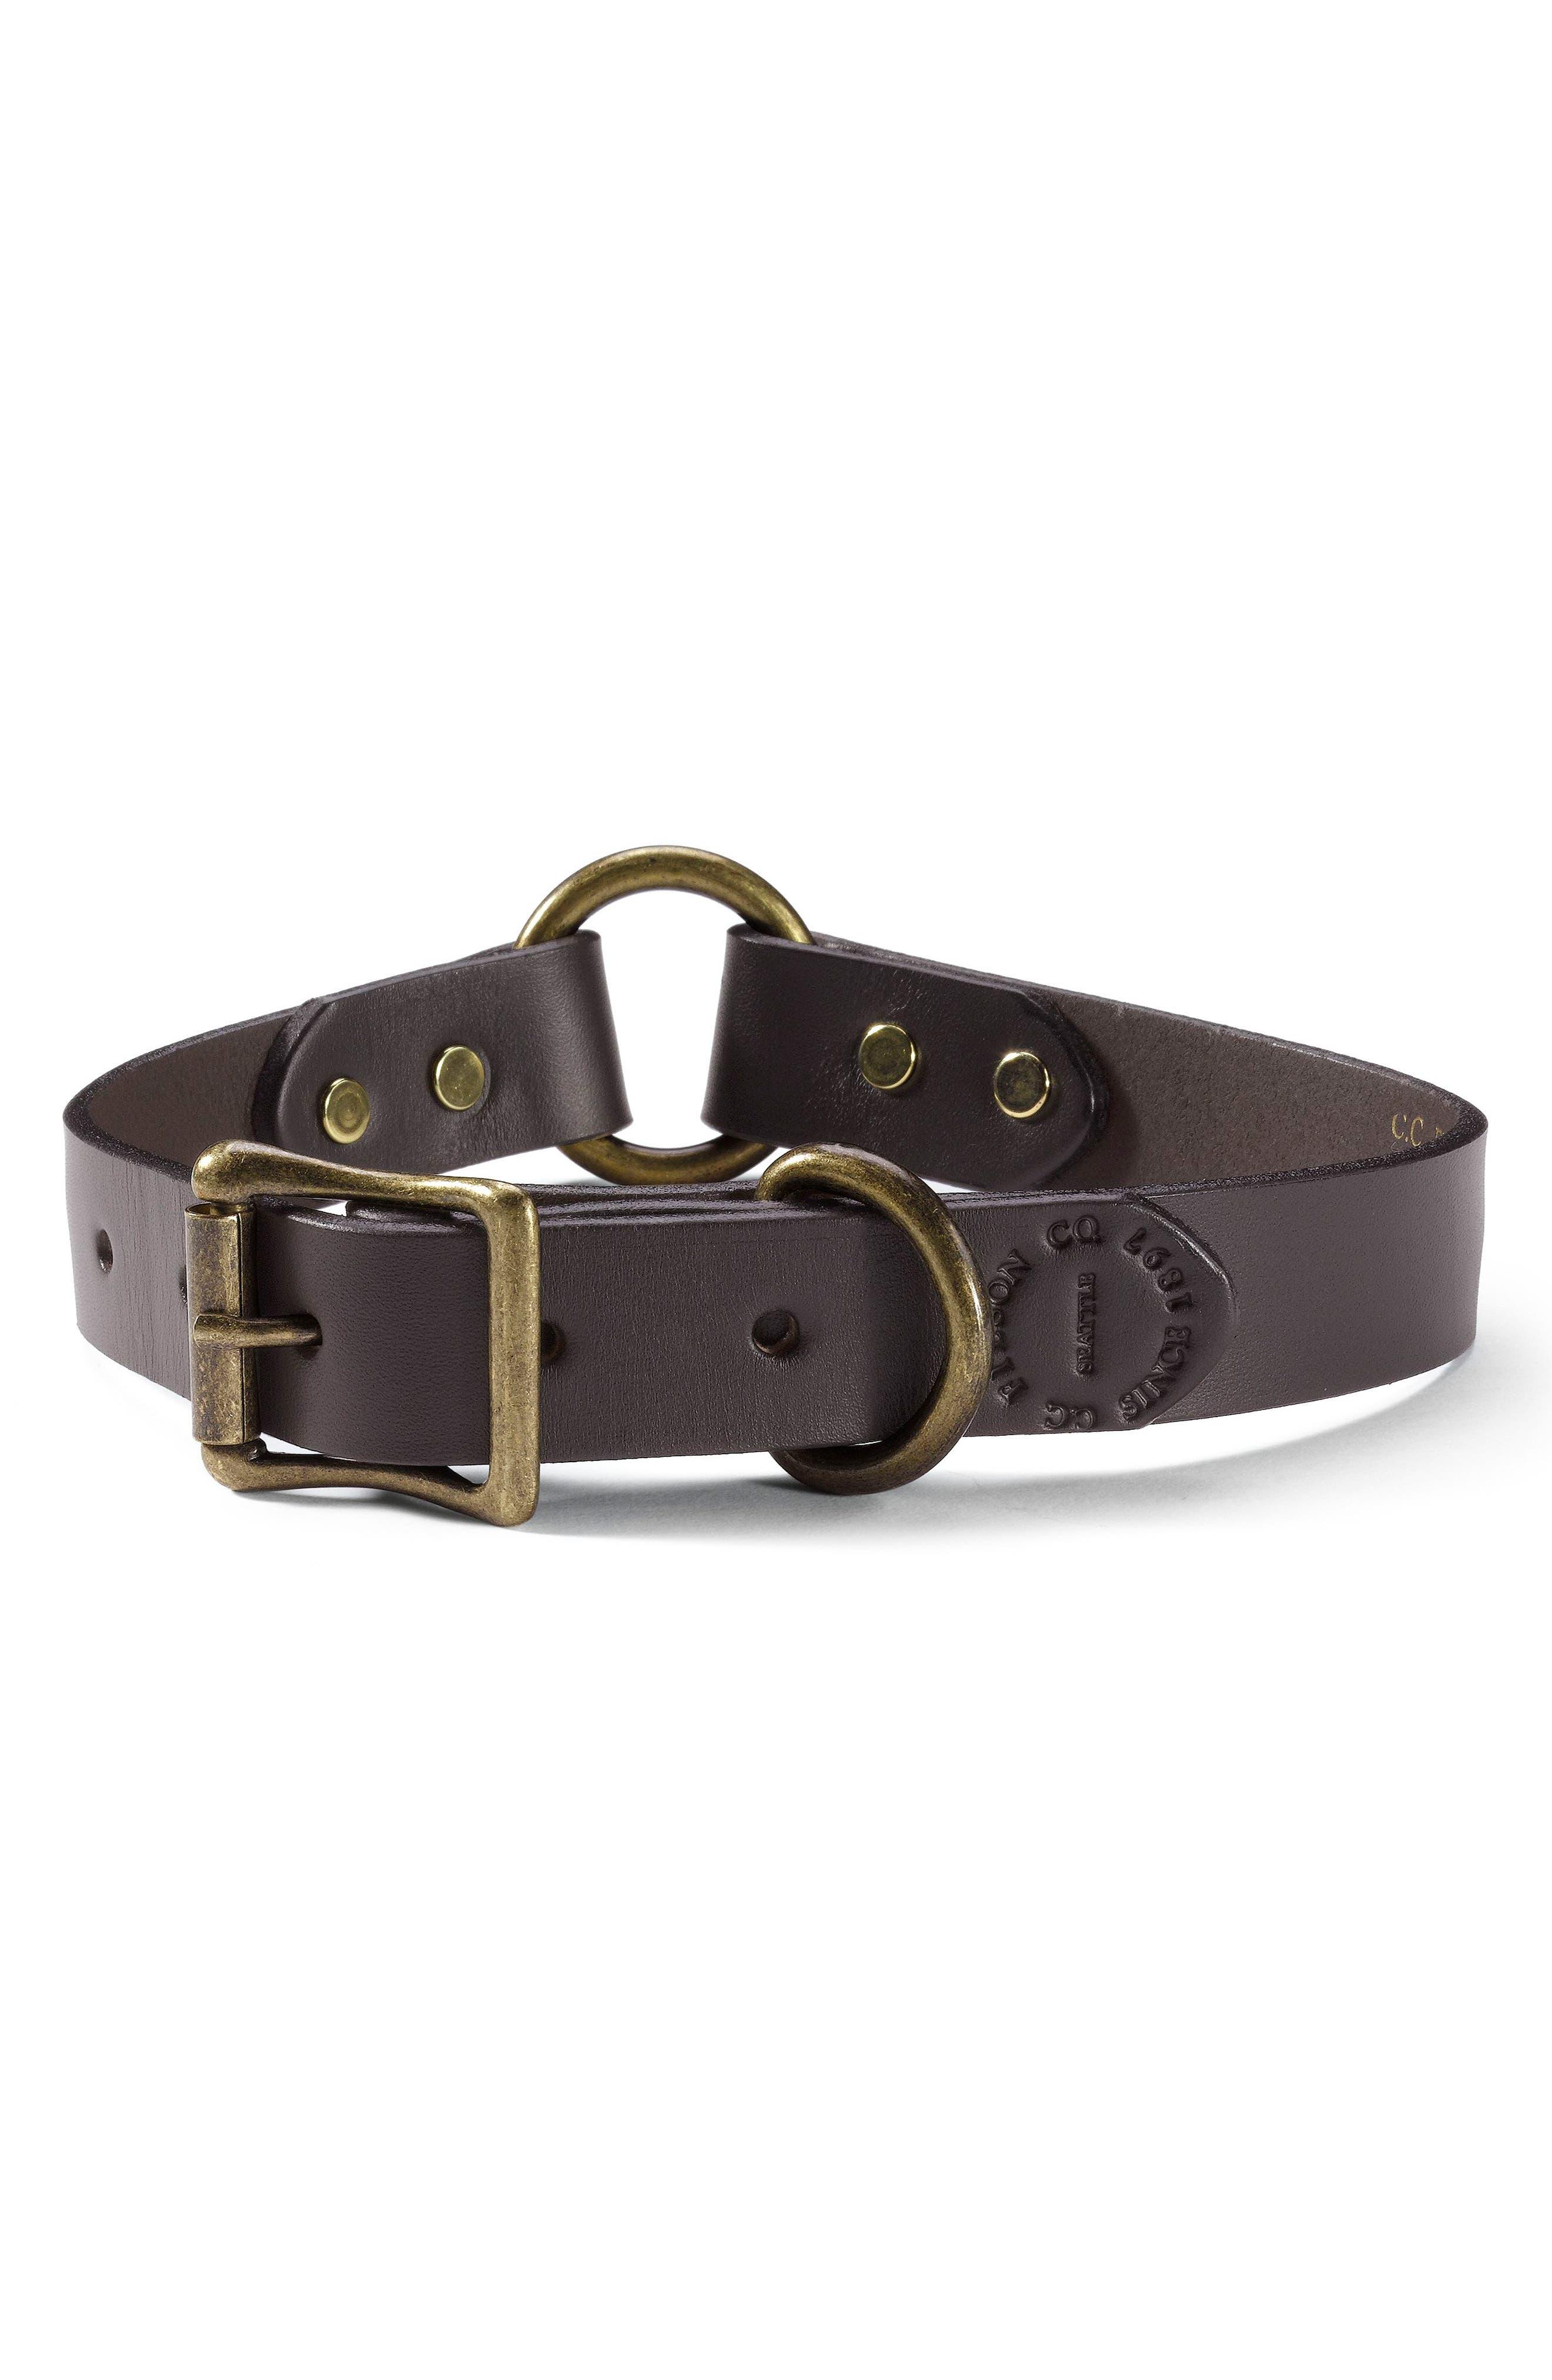 Alternate Image 1 Selected - Filson Leather Dog Collar